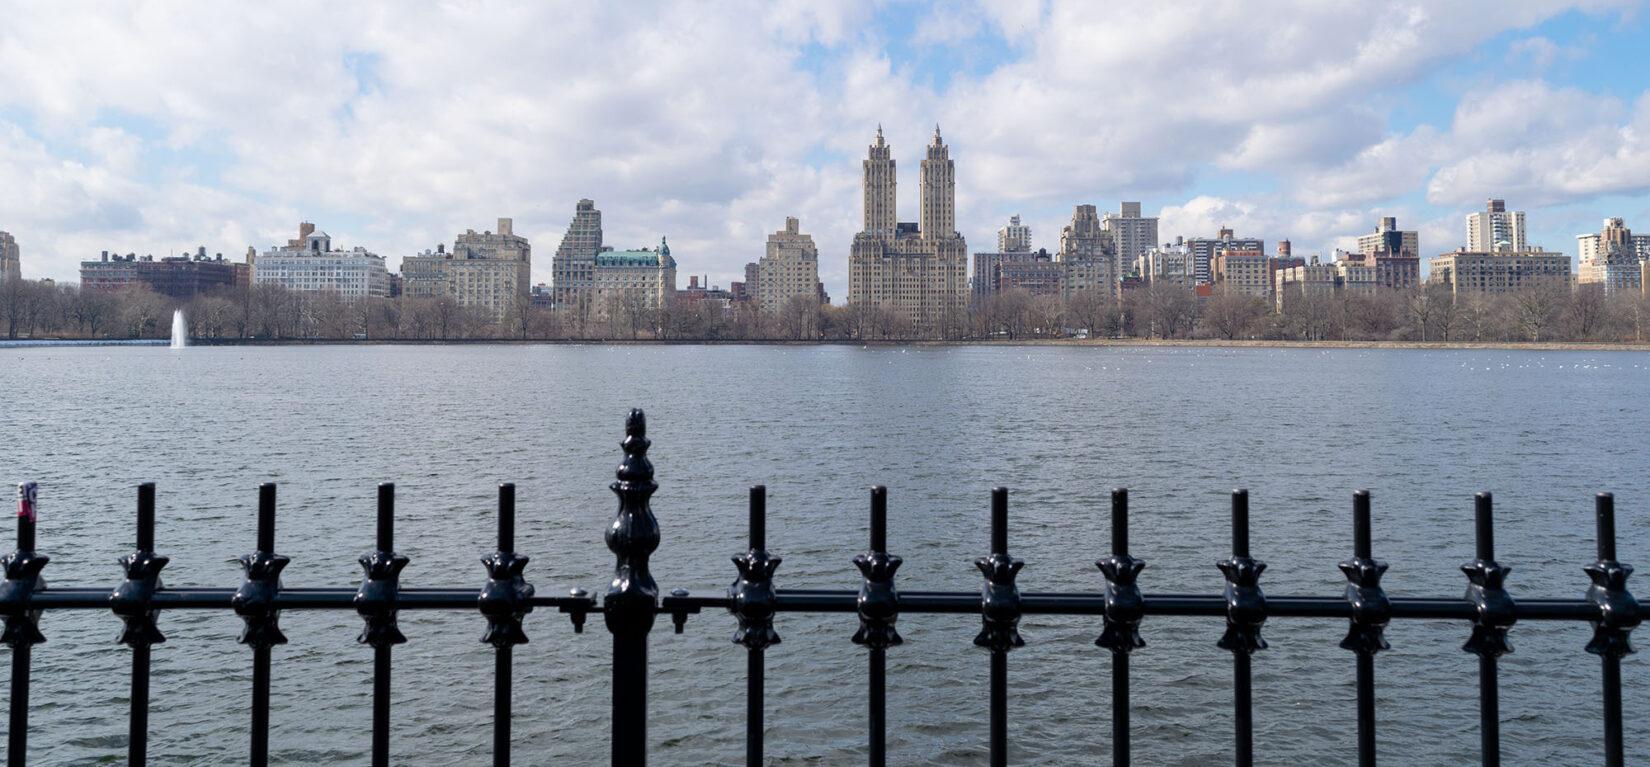 Meeting New York Citys Demand for Water